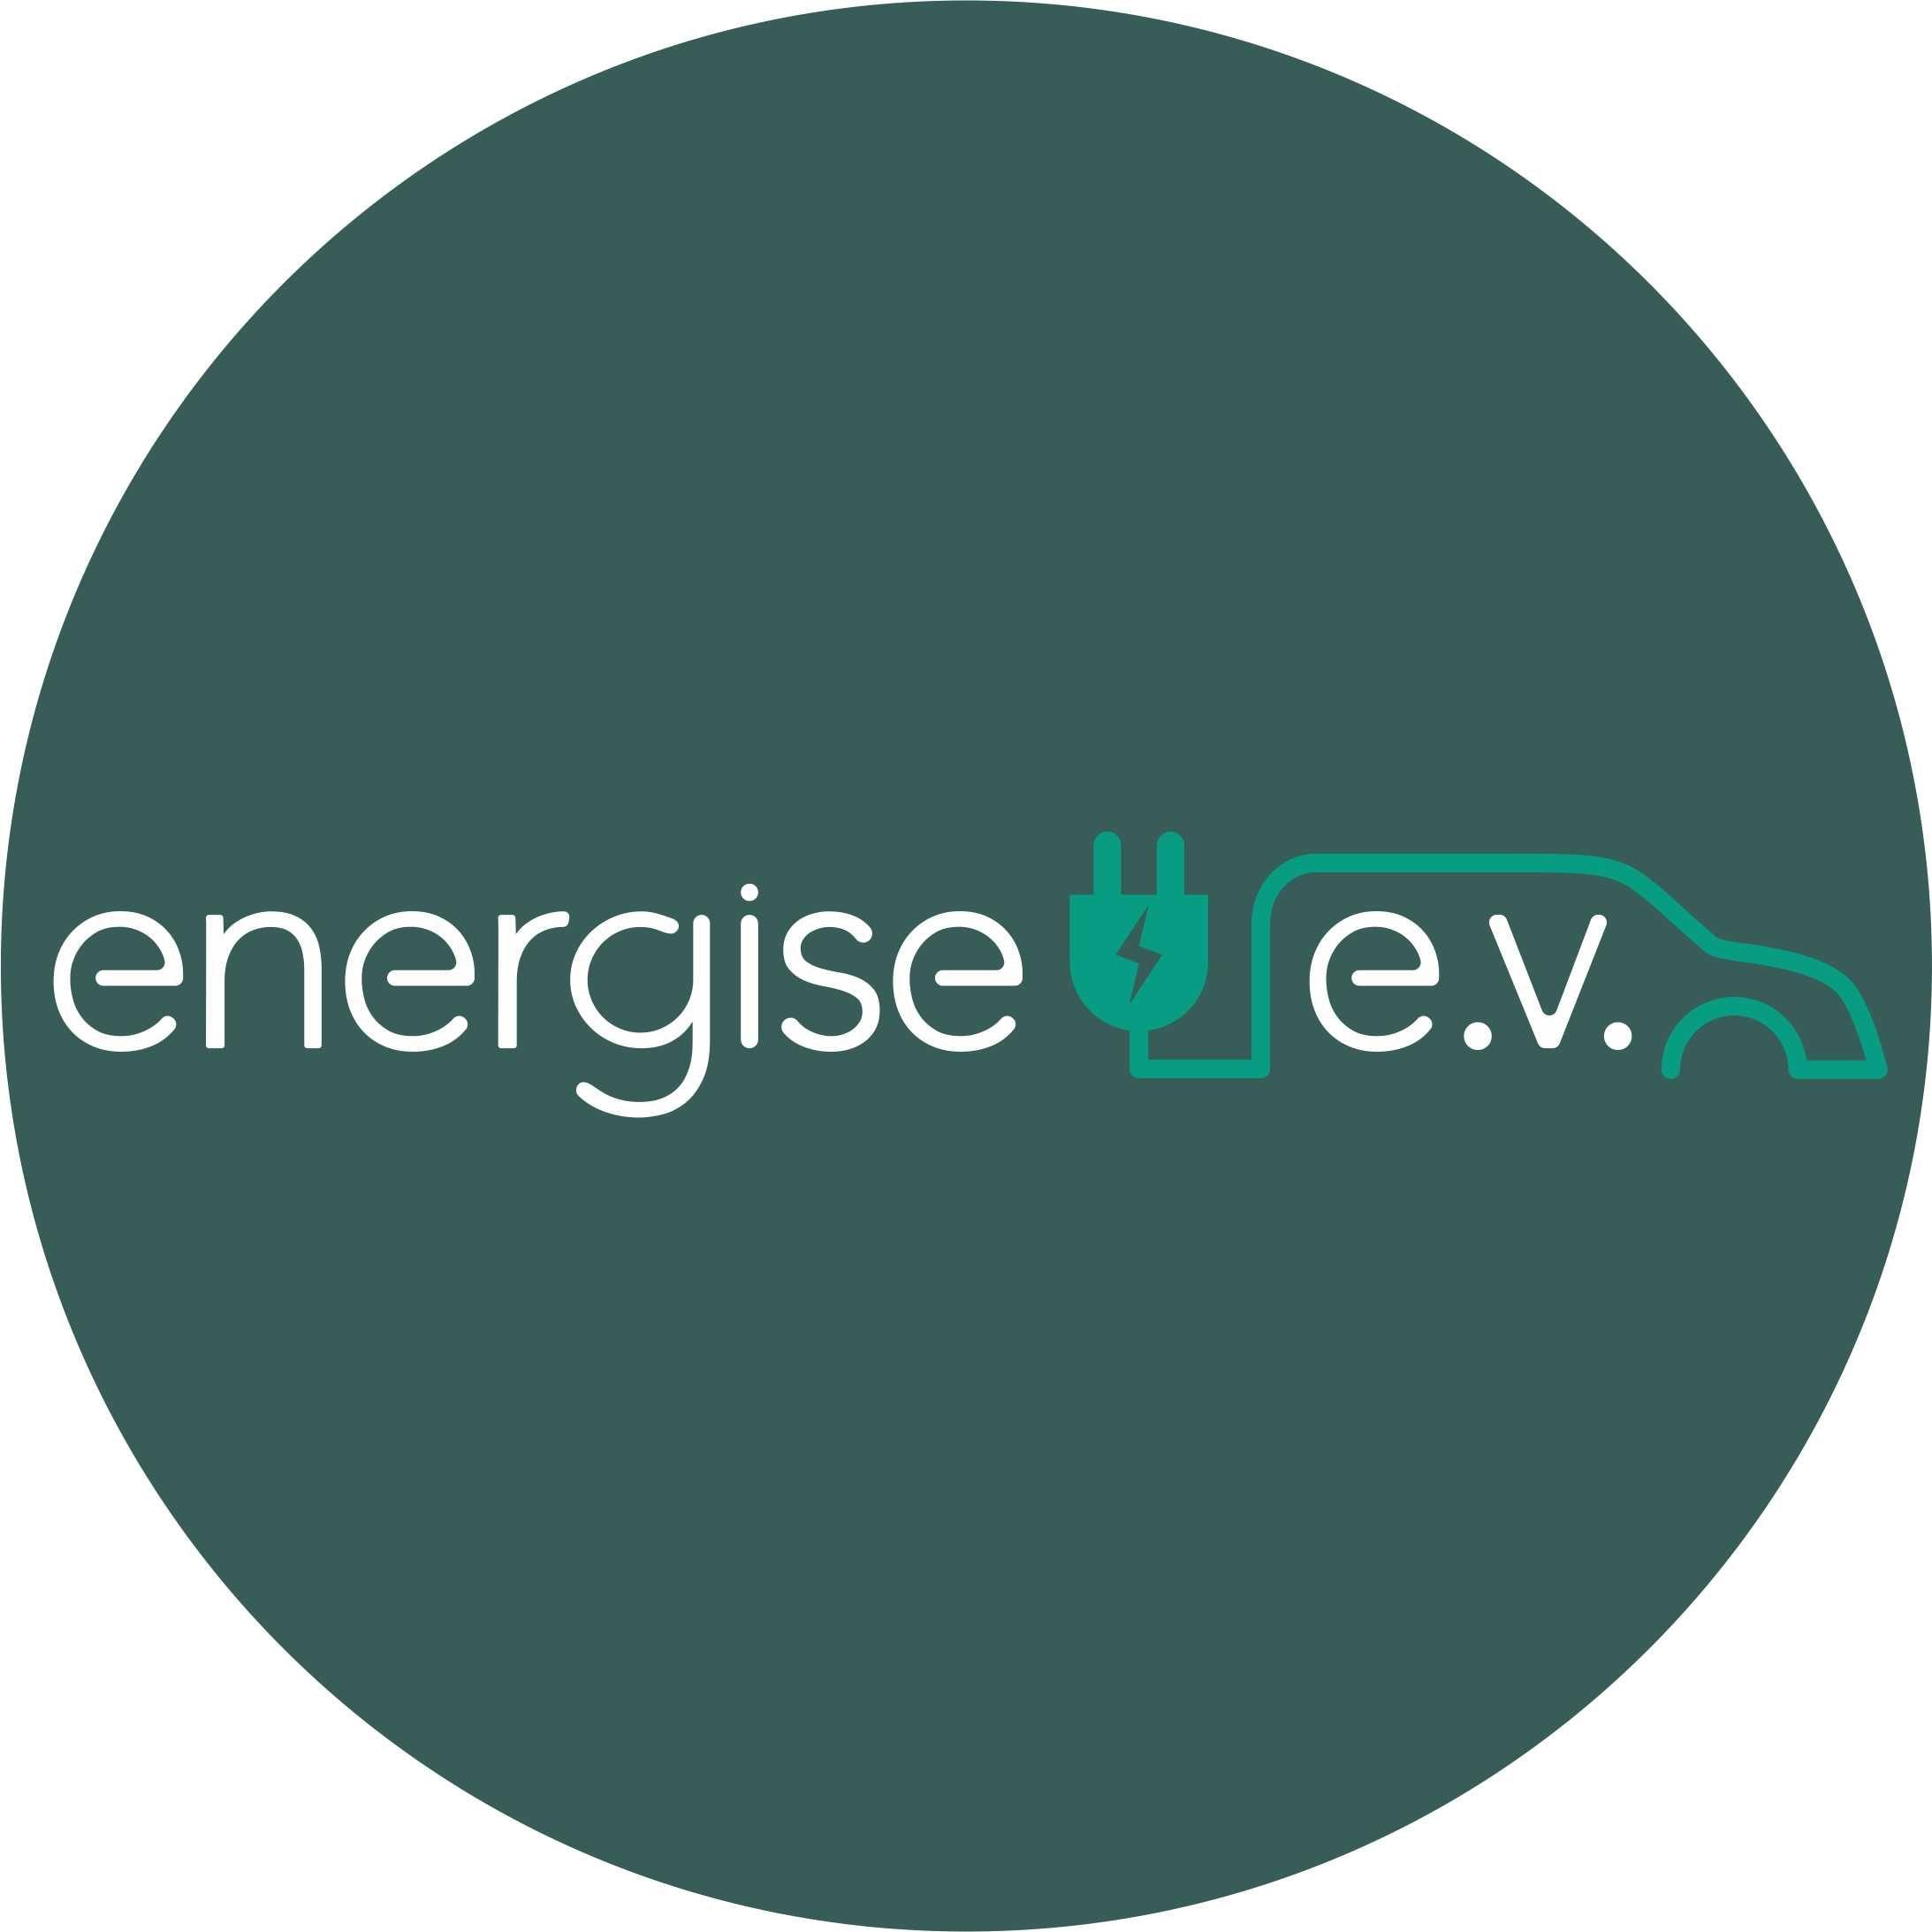 Luke Jenkins- Energize EV